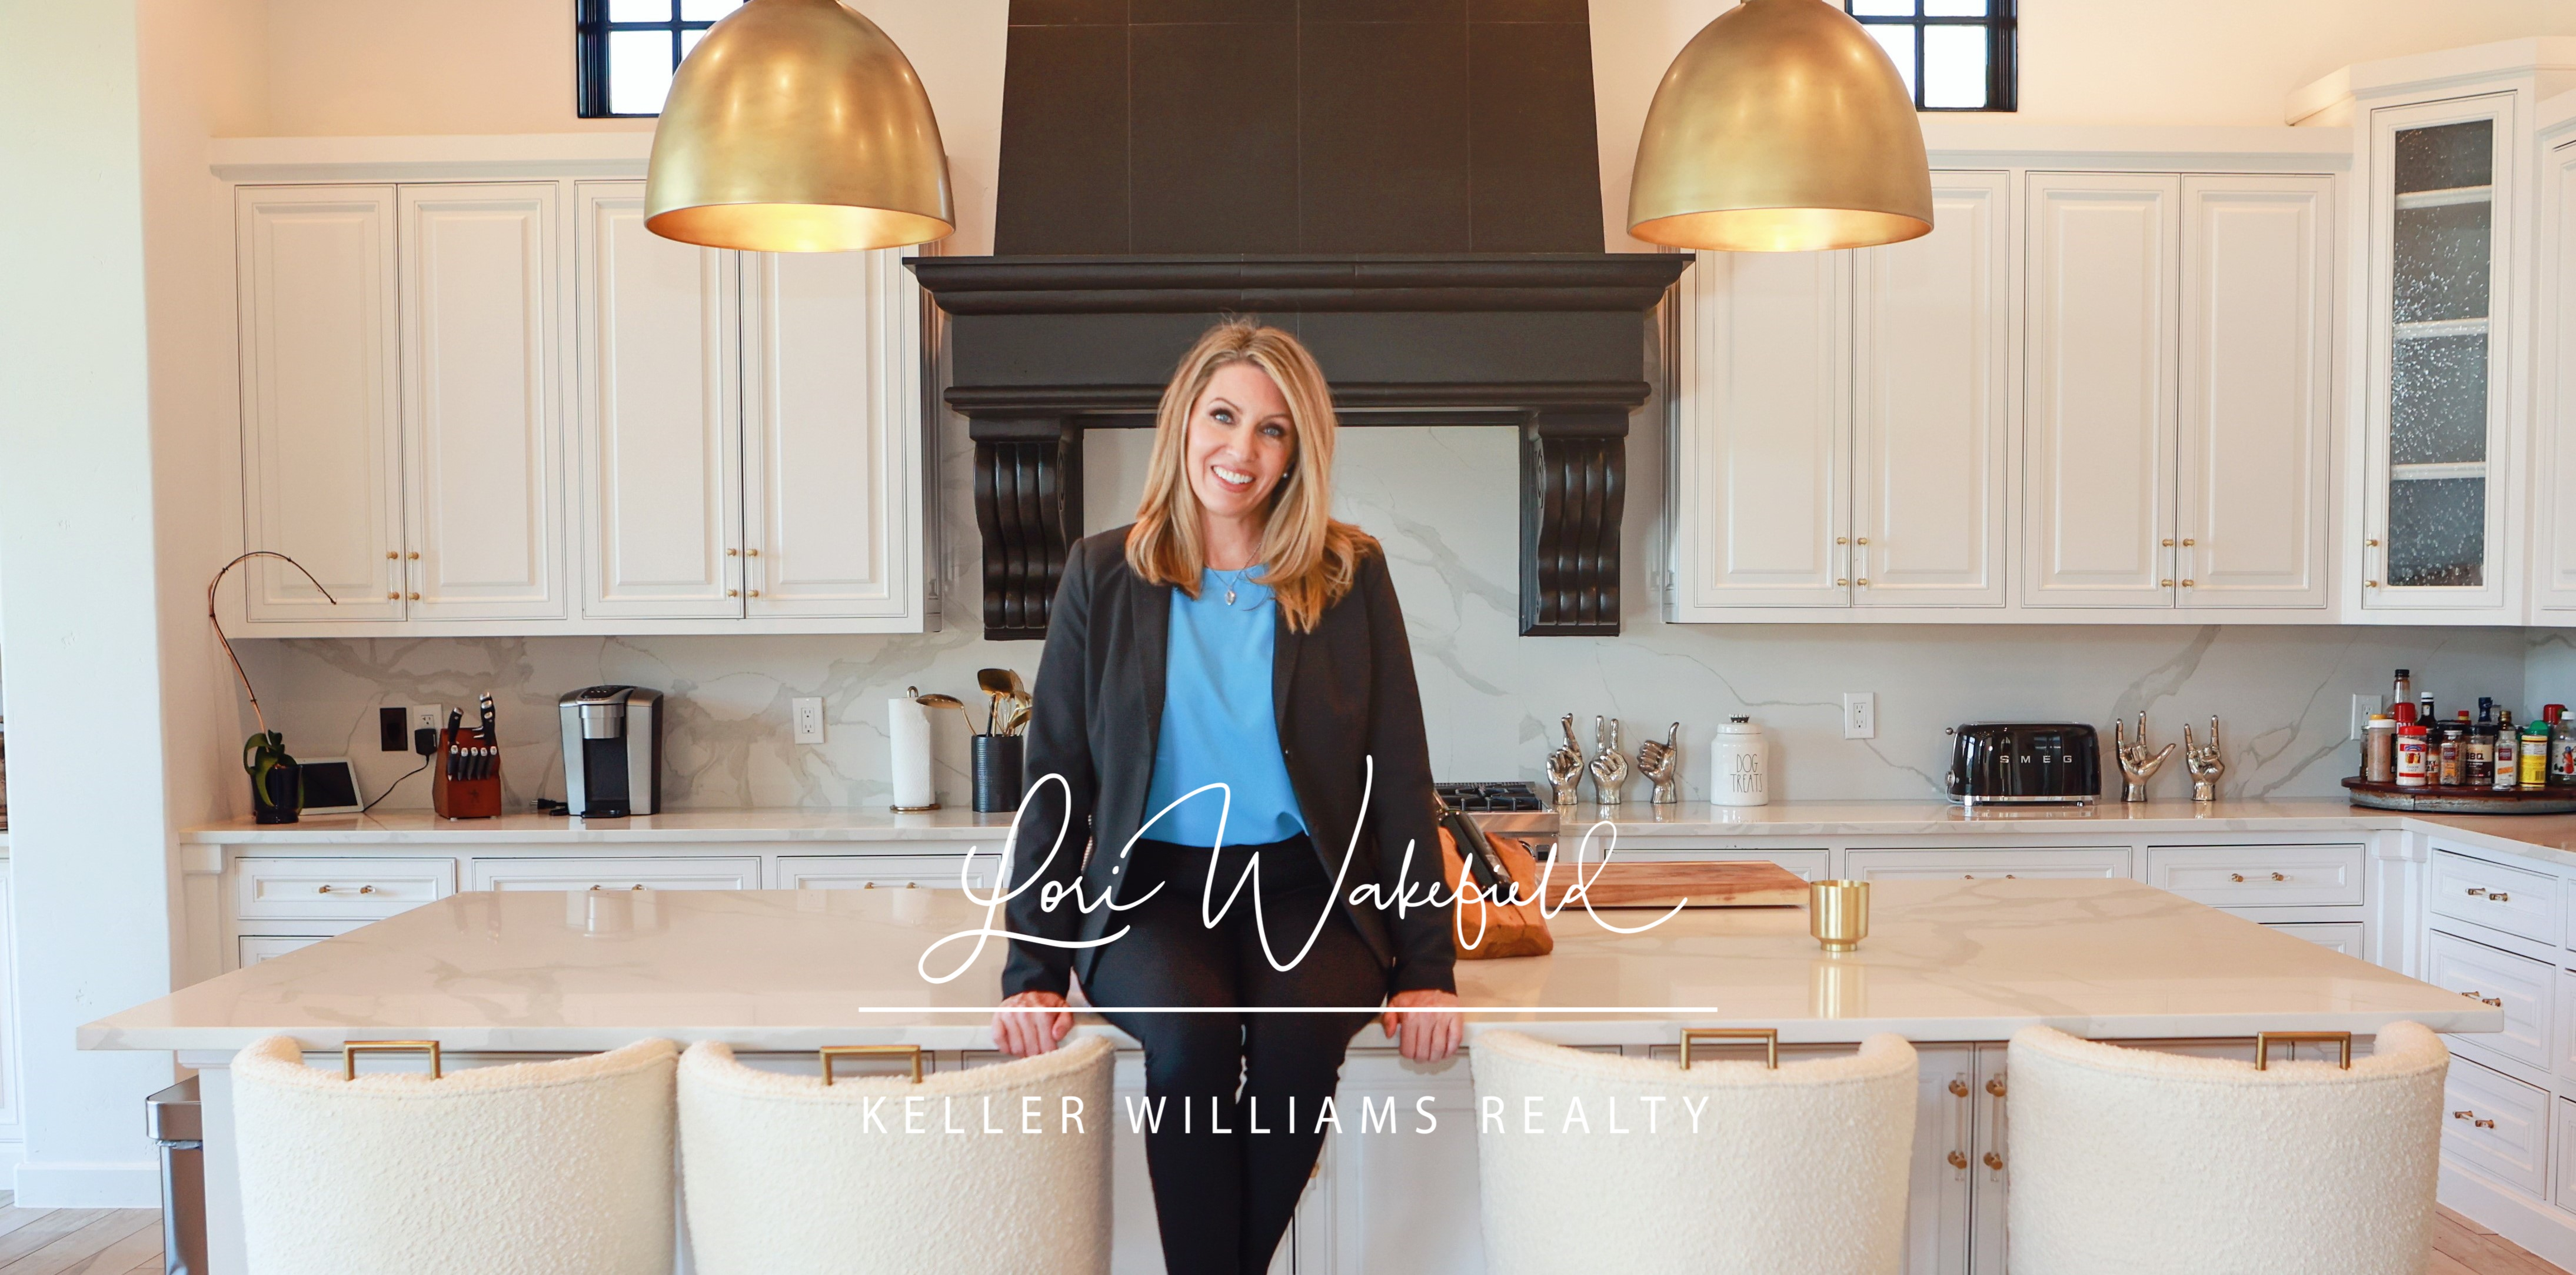 Lori Wakefield REALTOR   Keller Williams Austin TX   512-657-4455